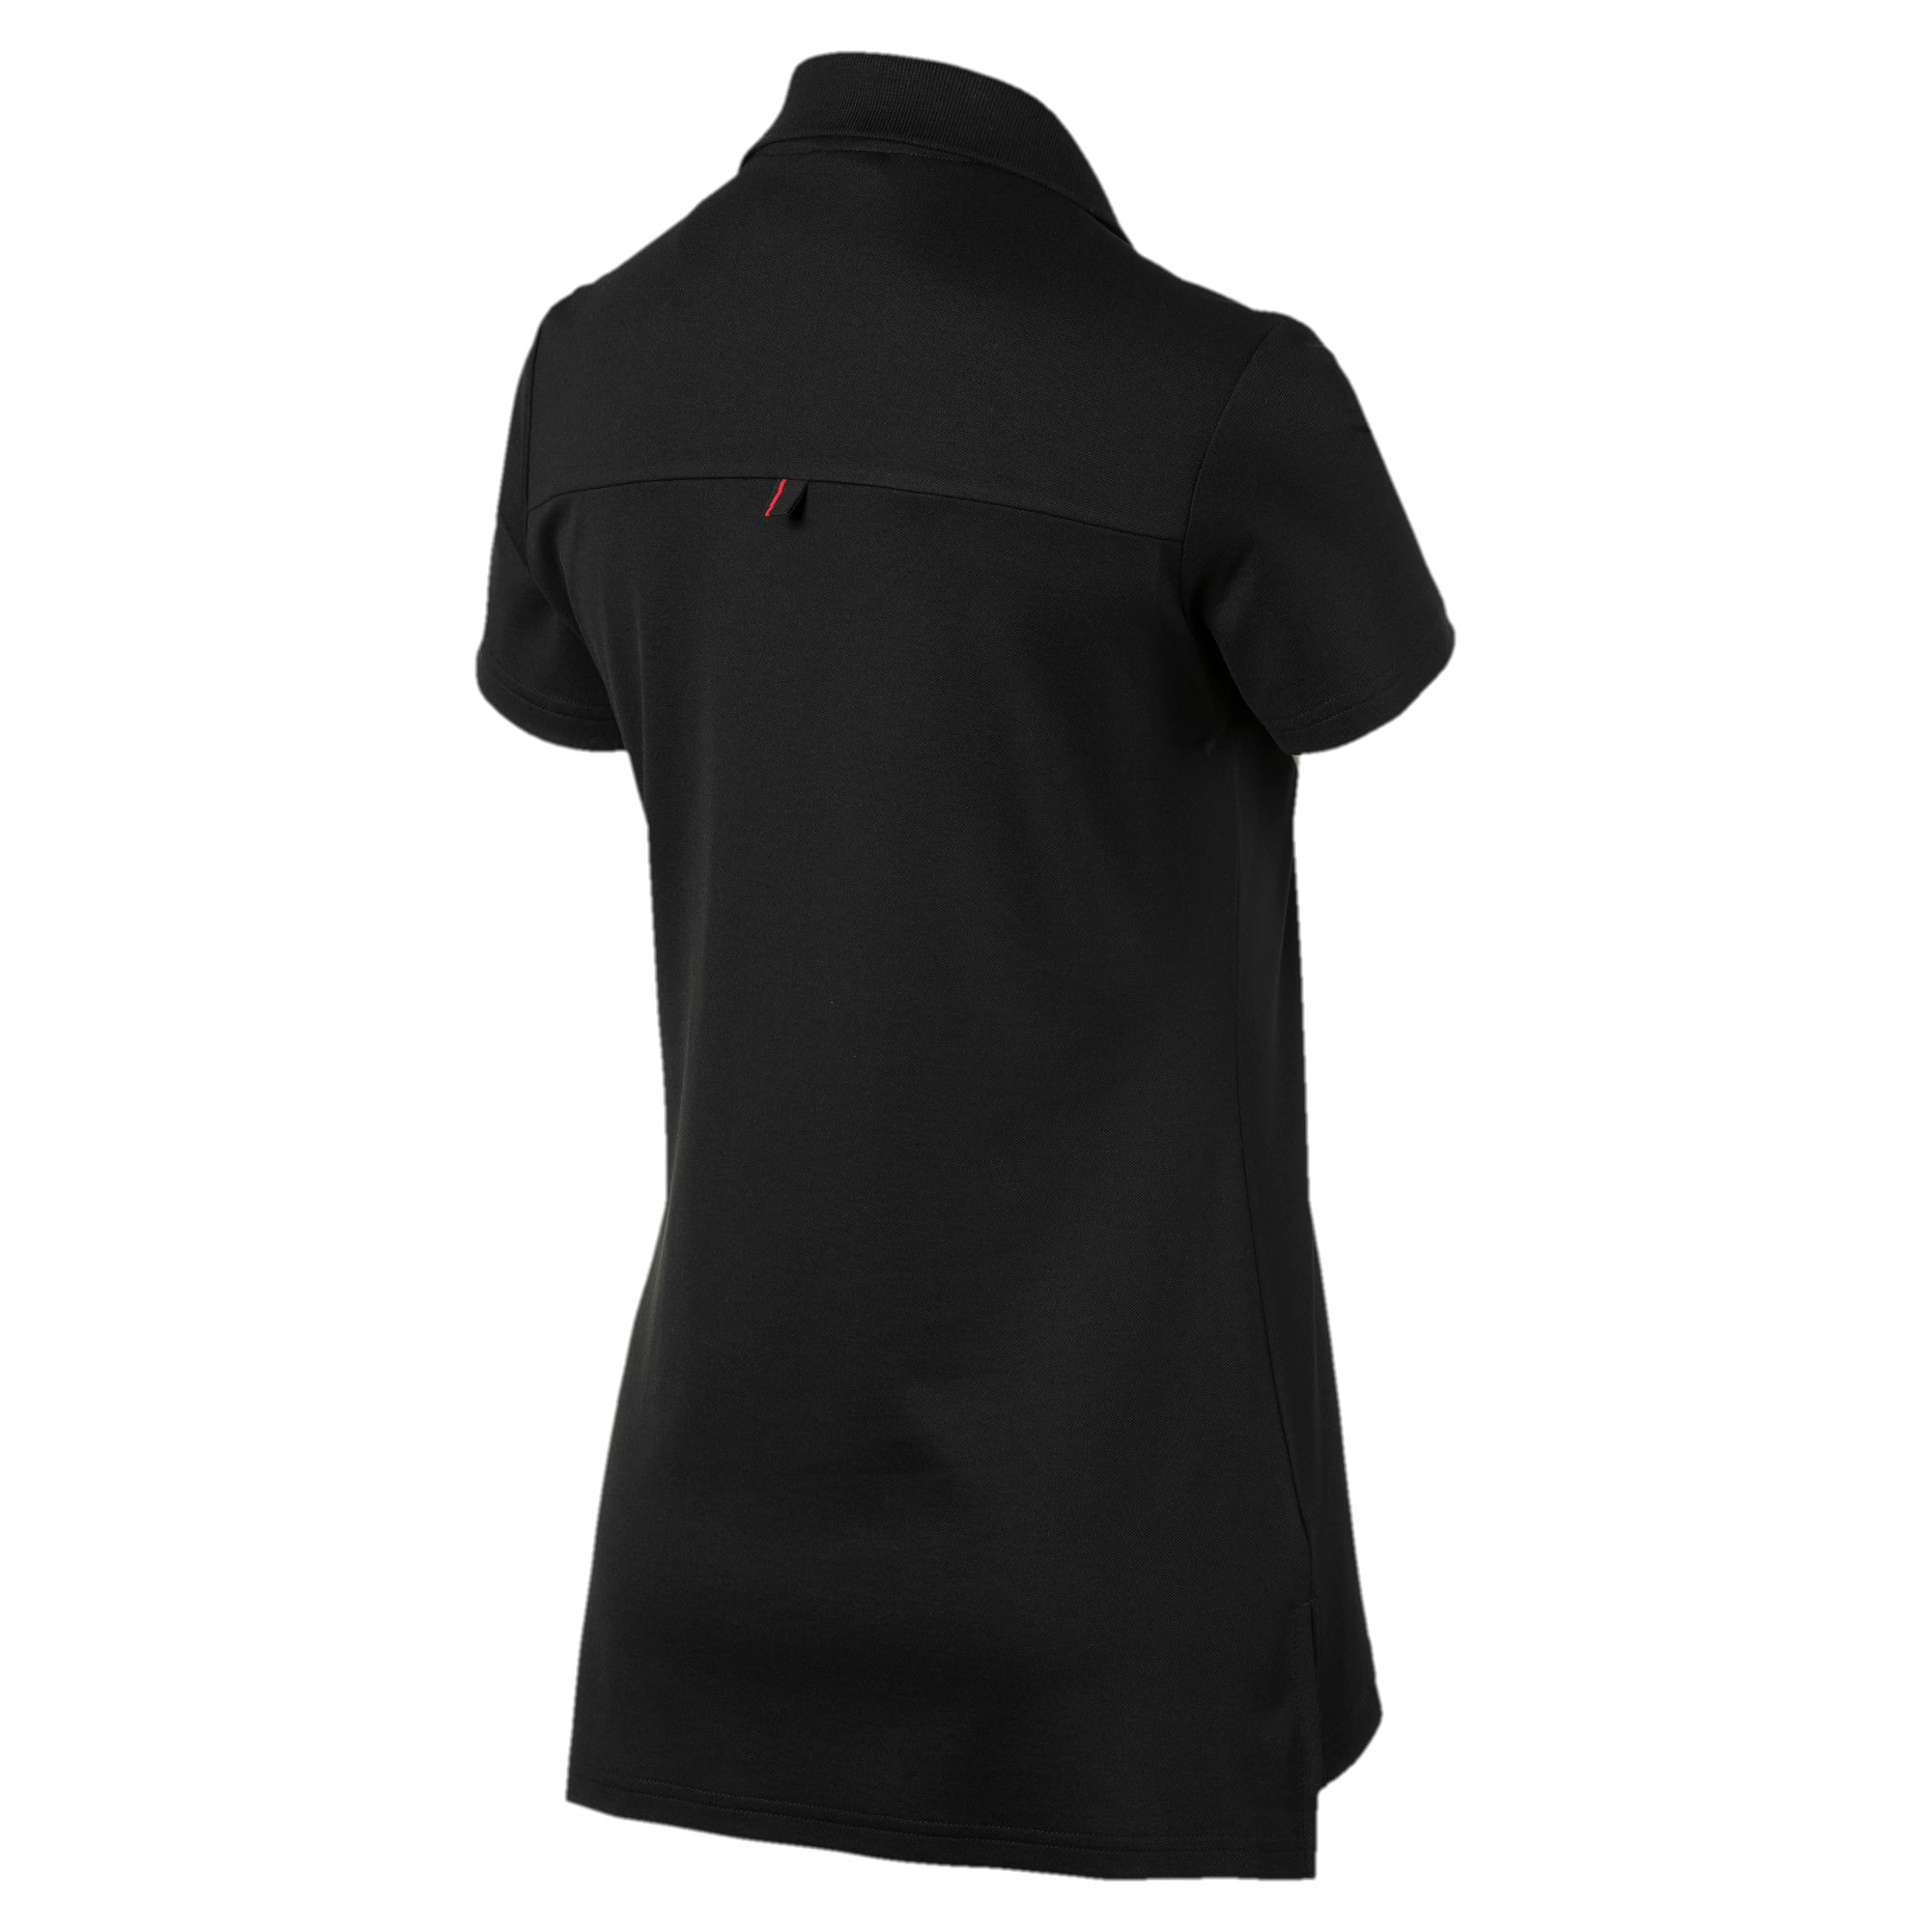 Thumbnail 5 of Ferrari Women's Polo Shirt, Puma Black, medium